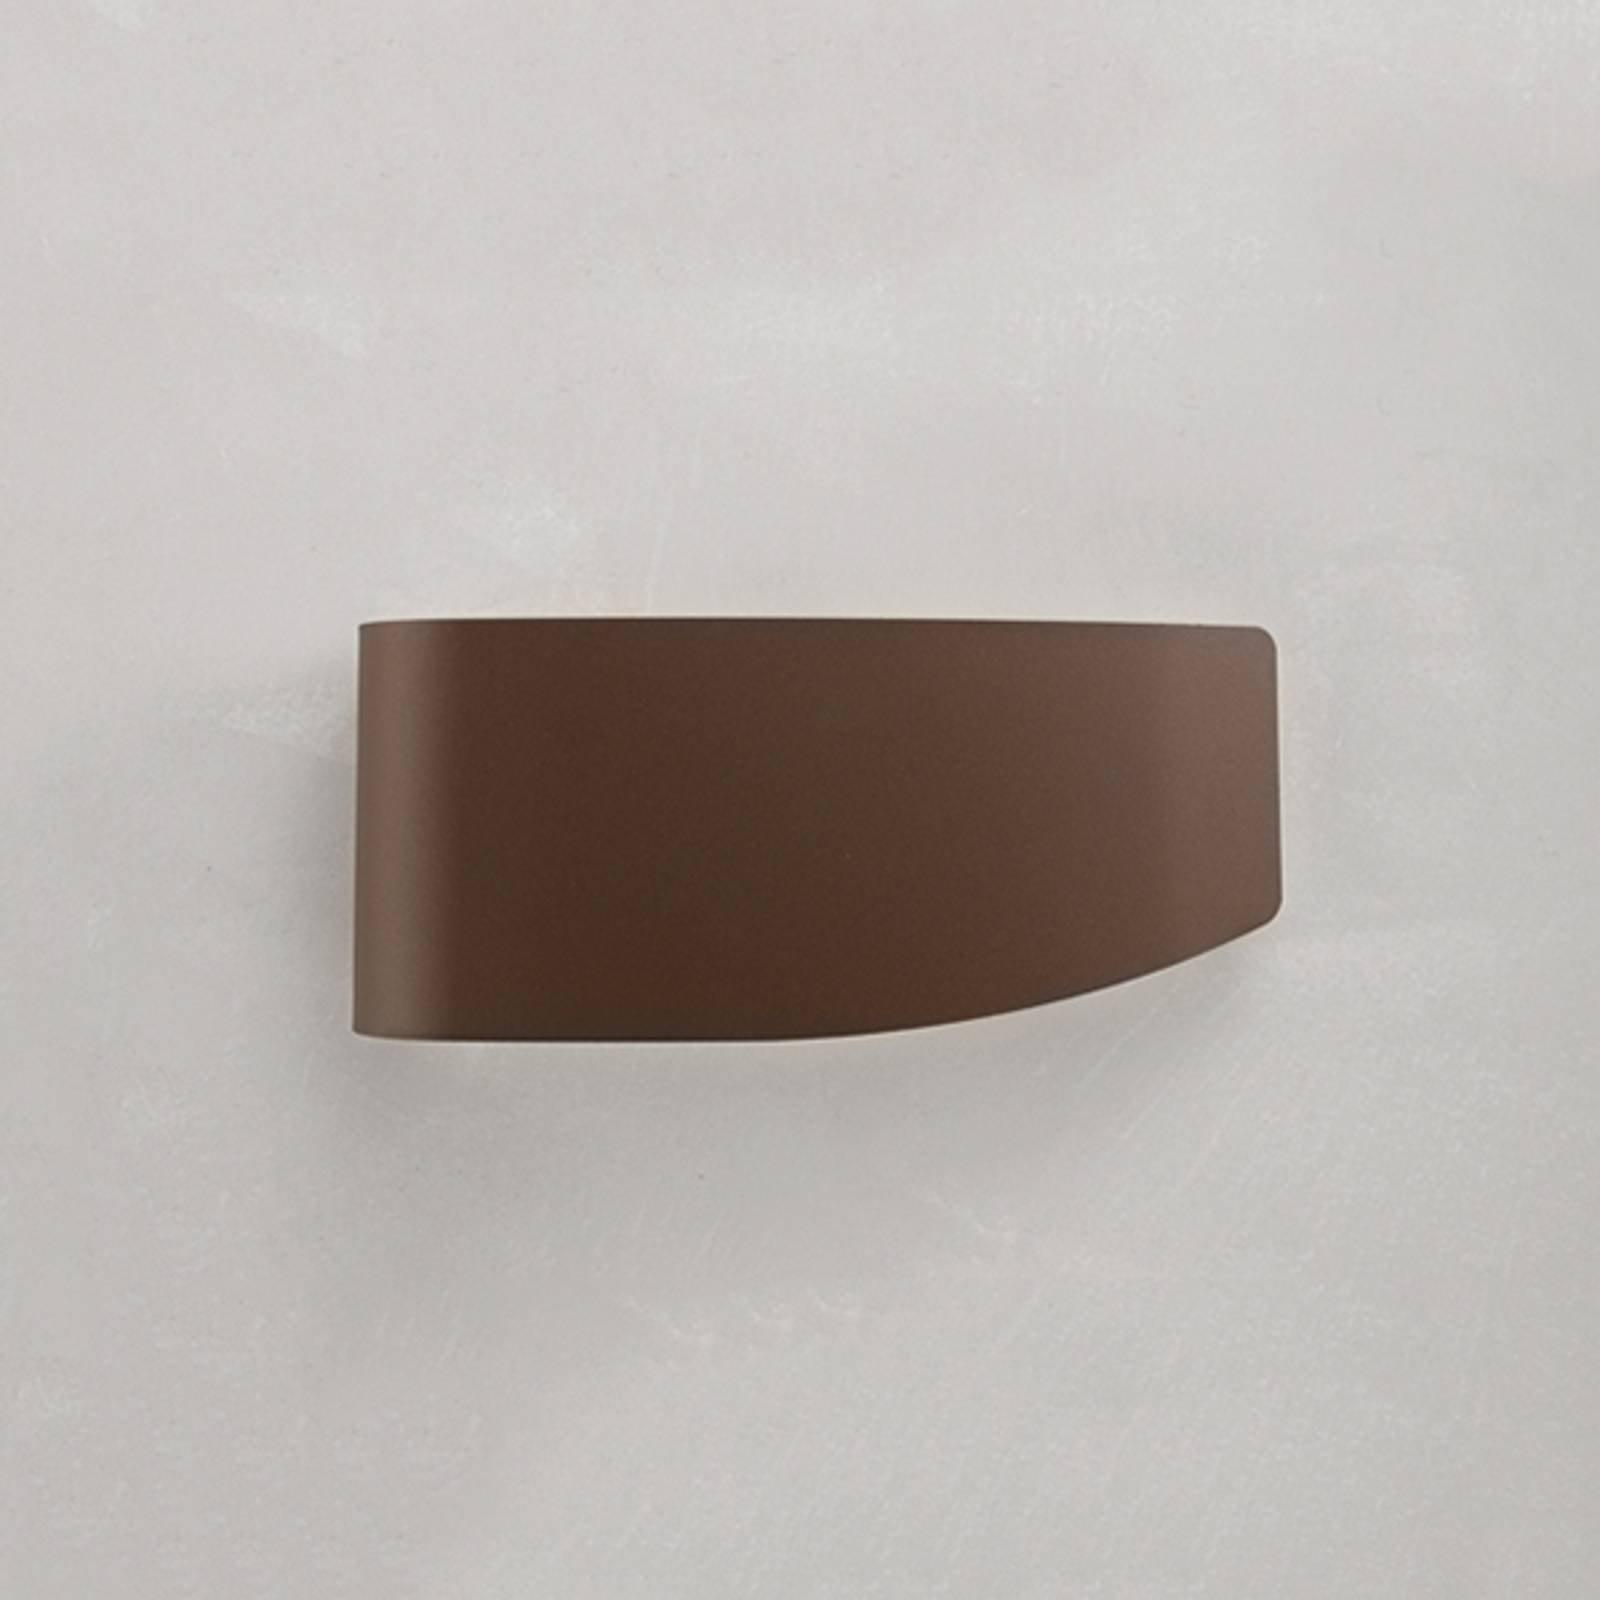 Vegglampe Virgola med dekorativt design, brun